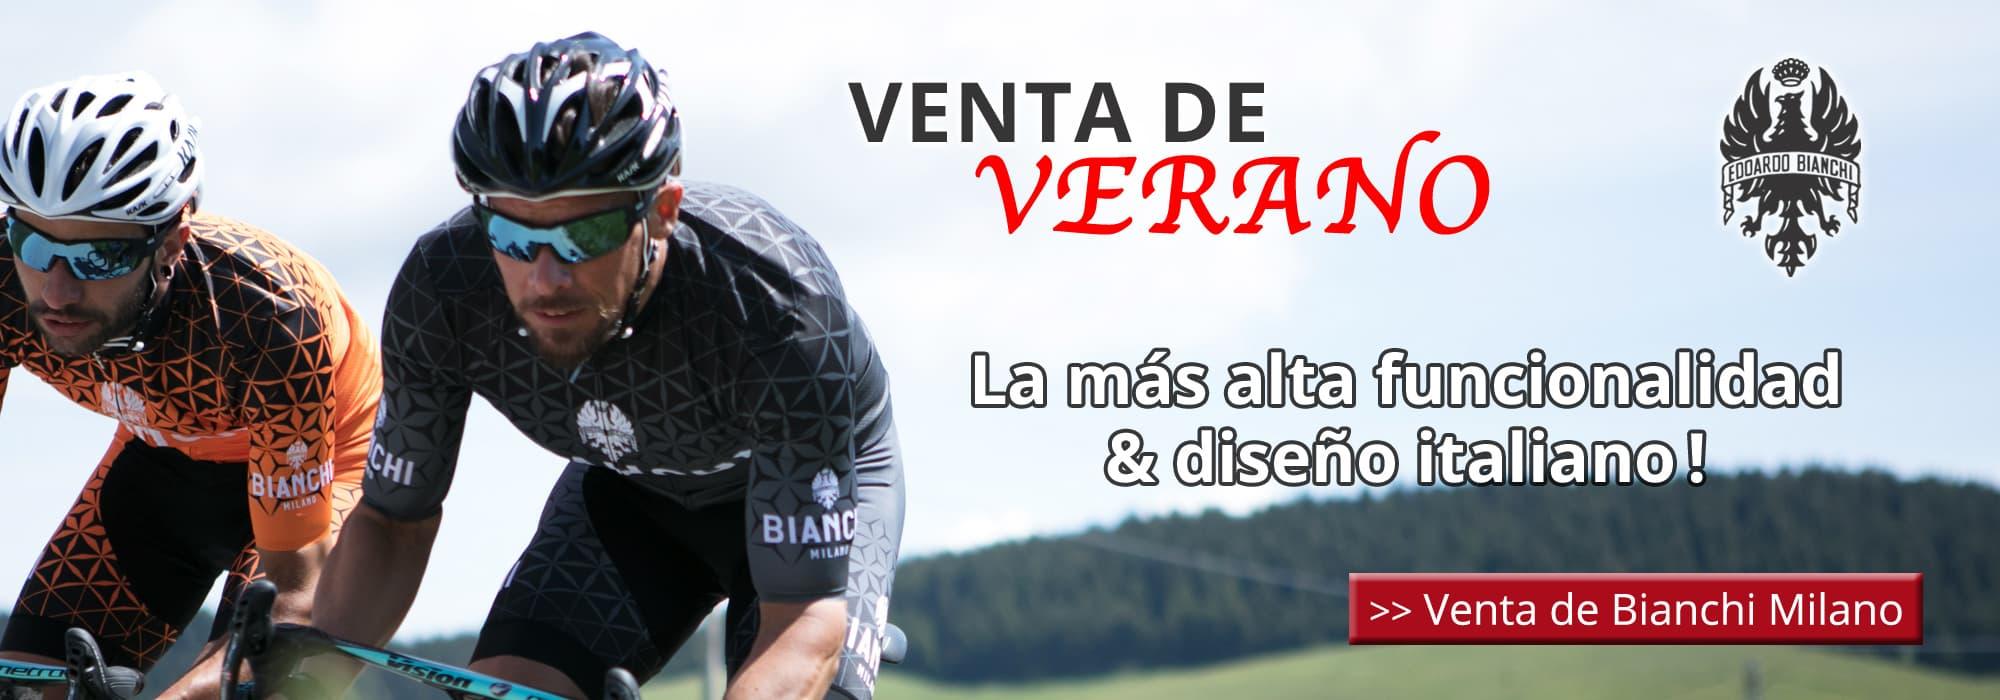 Bianchi Milano - Venta de Verano